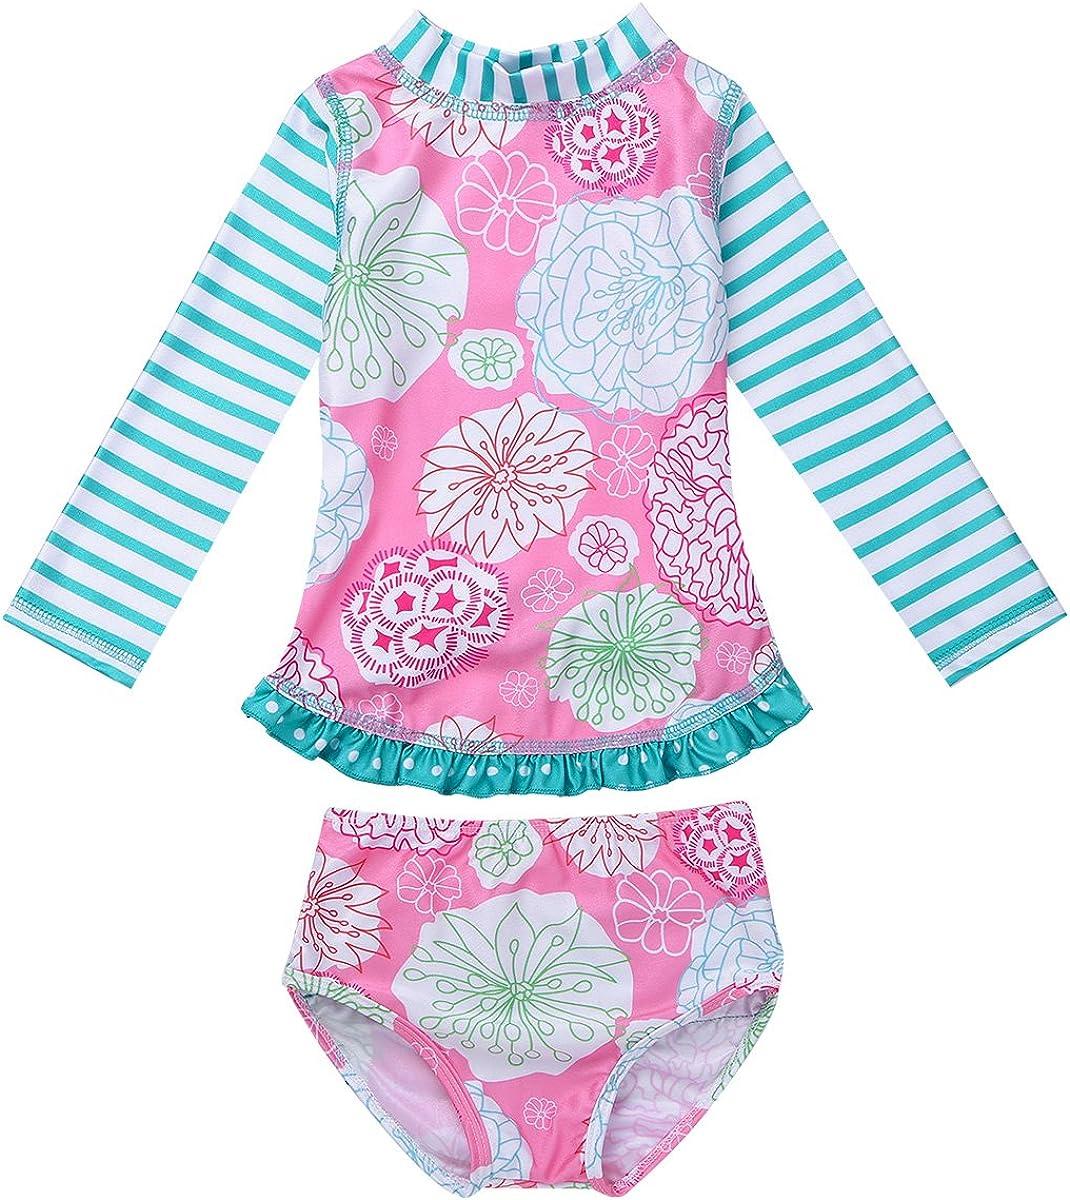 ranrann Infant Baby Girls One Piece Rash Guard Swimwear Long Sleeves Ruffled Floral Printed Swimsuits Bathing Suit Beachwear